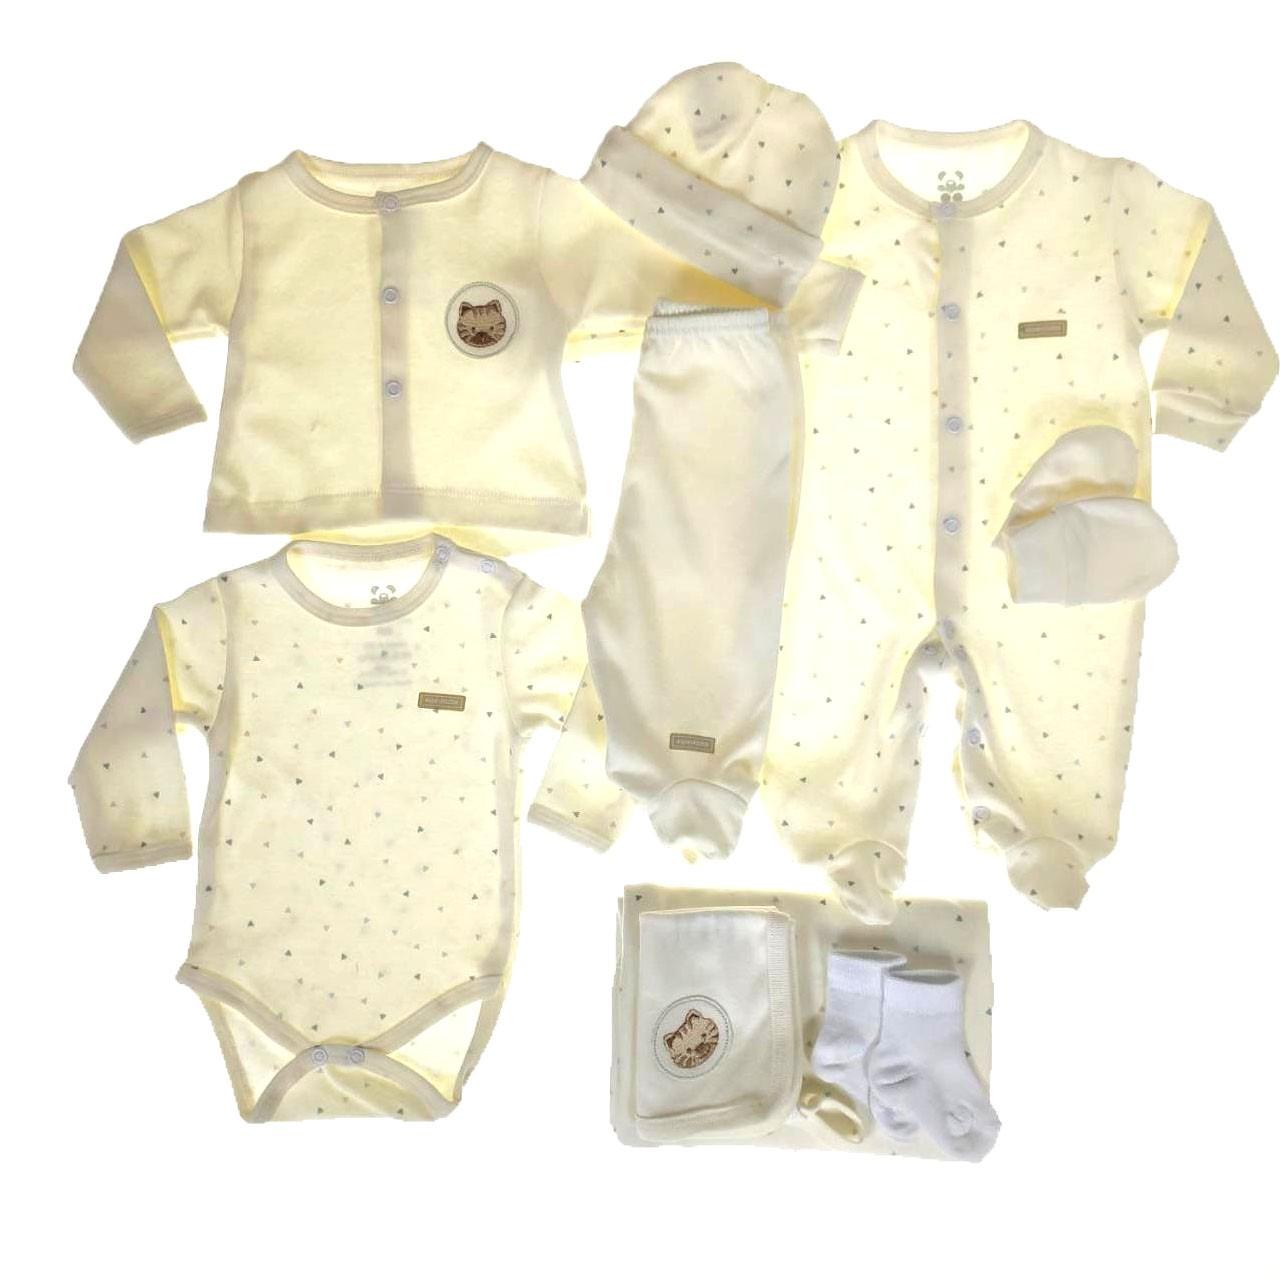 Kit Saída Maternidade Cru - 9 Peças